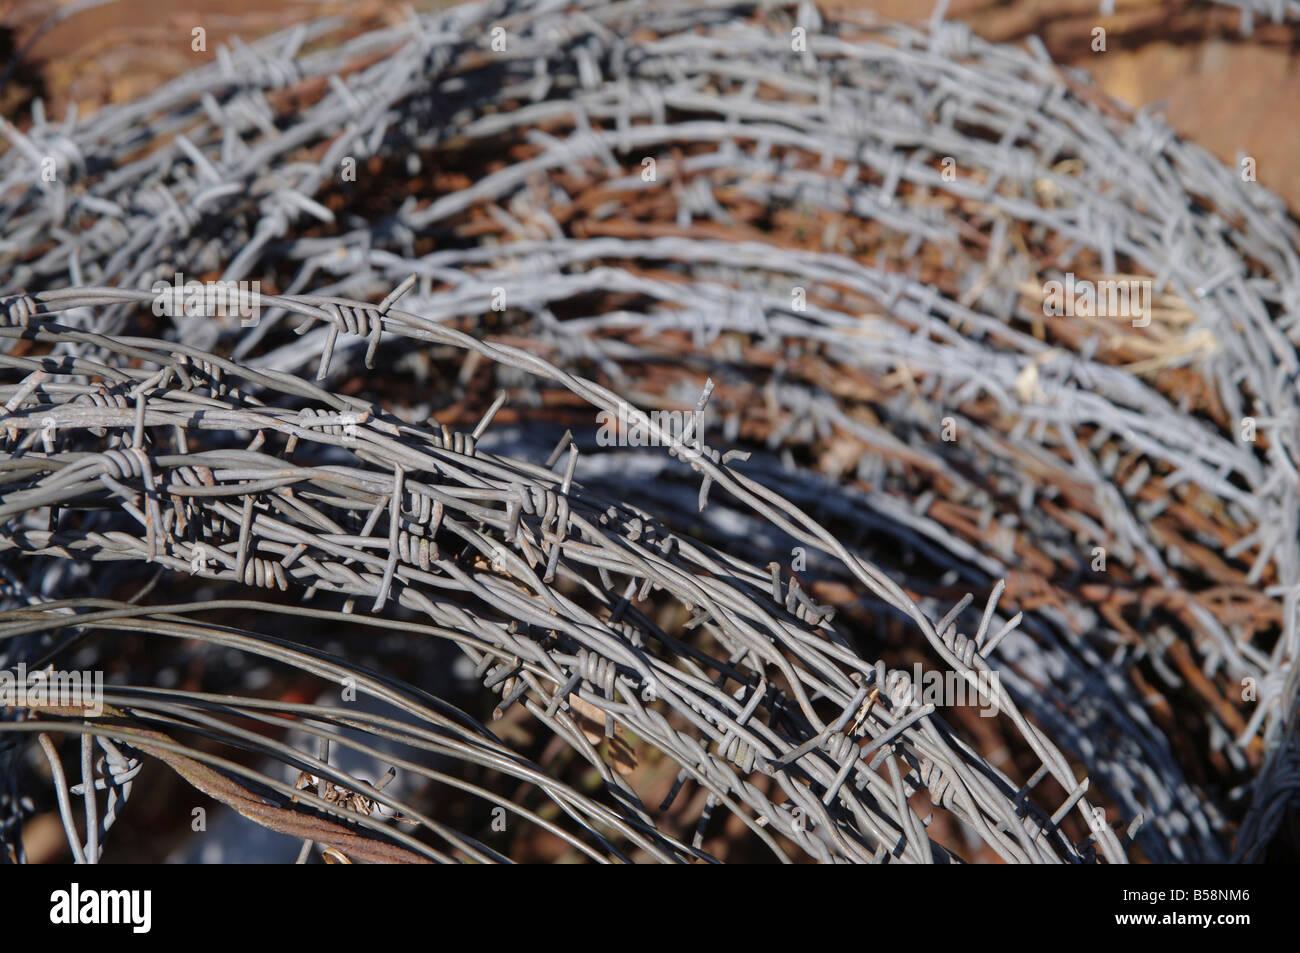 close up photo of rusty barbwire - Stock Image